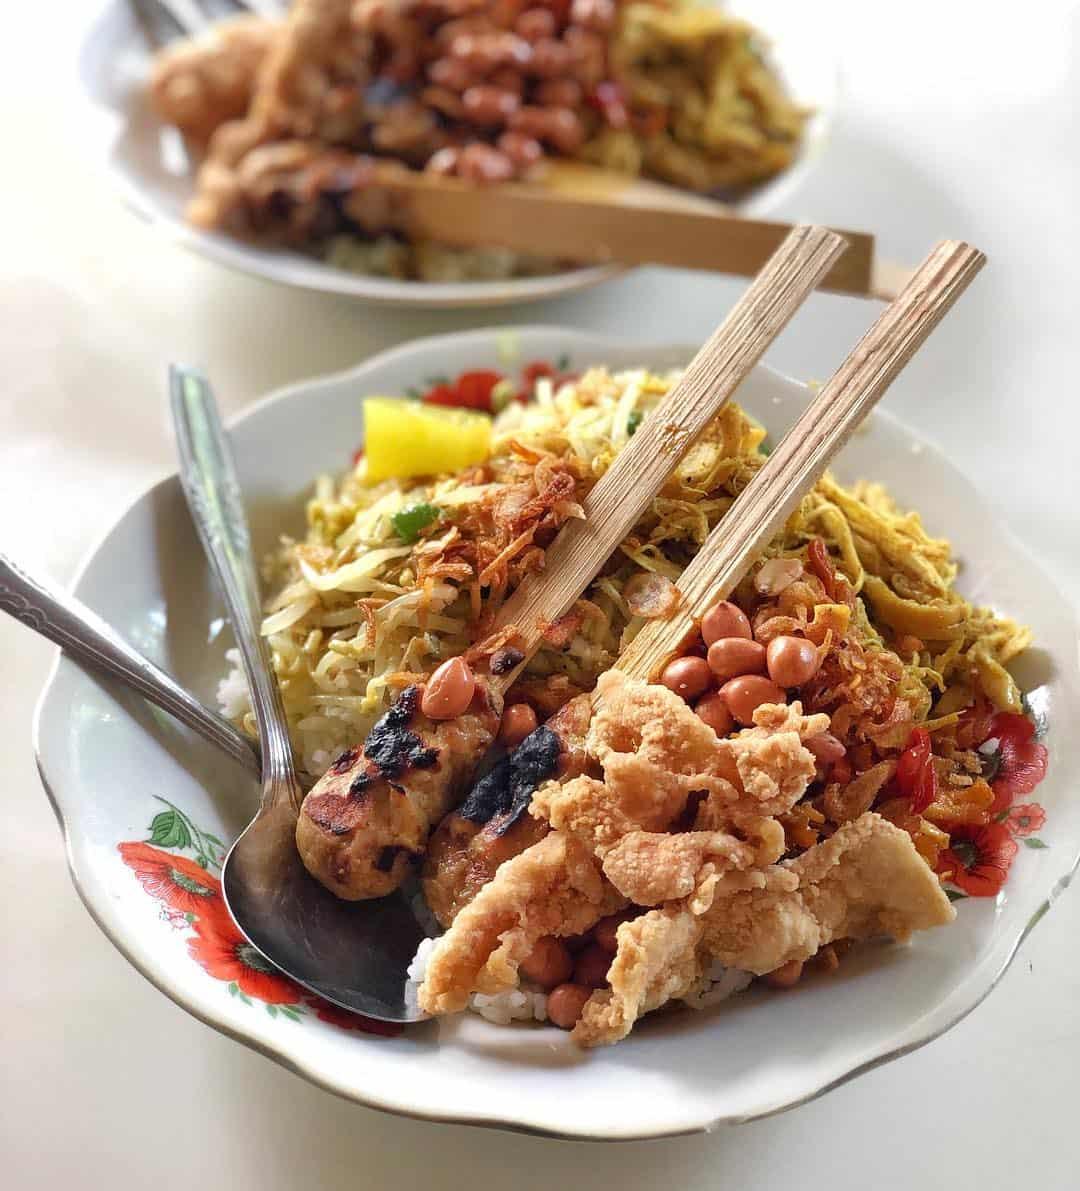 Warung Nasi Bali Men Weti Sumber Instagram itweeeats-min